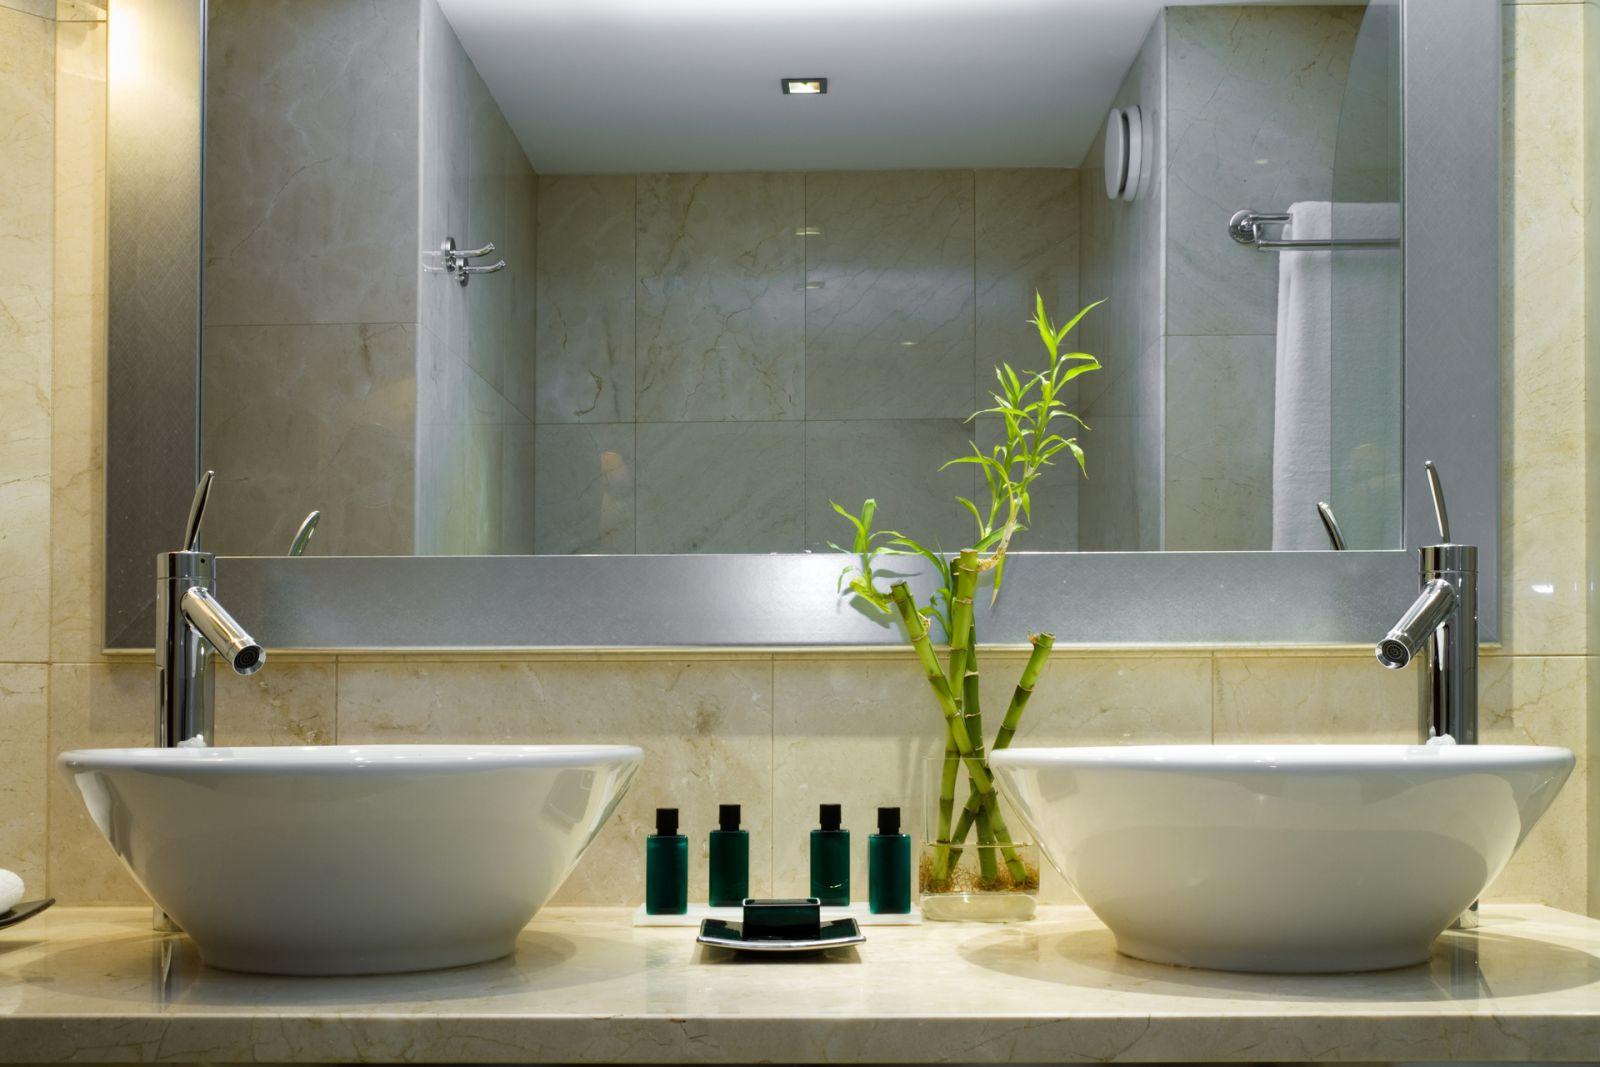 vệ sinh lavabo